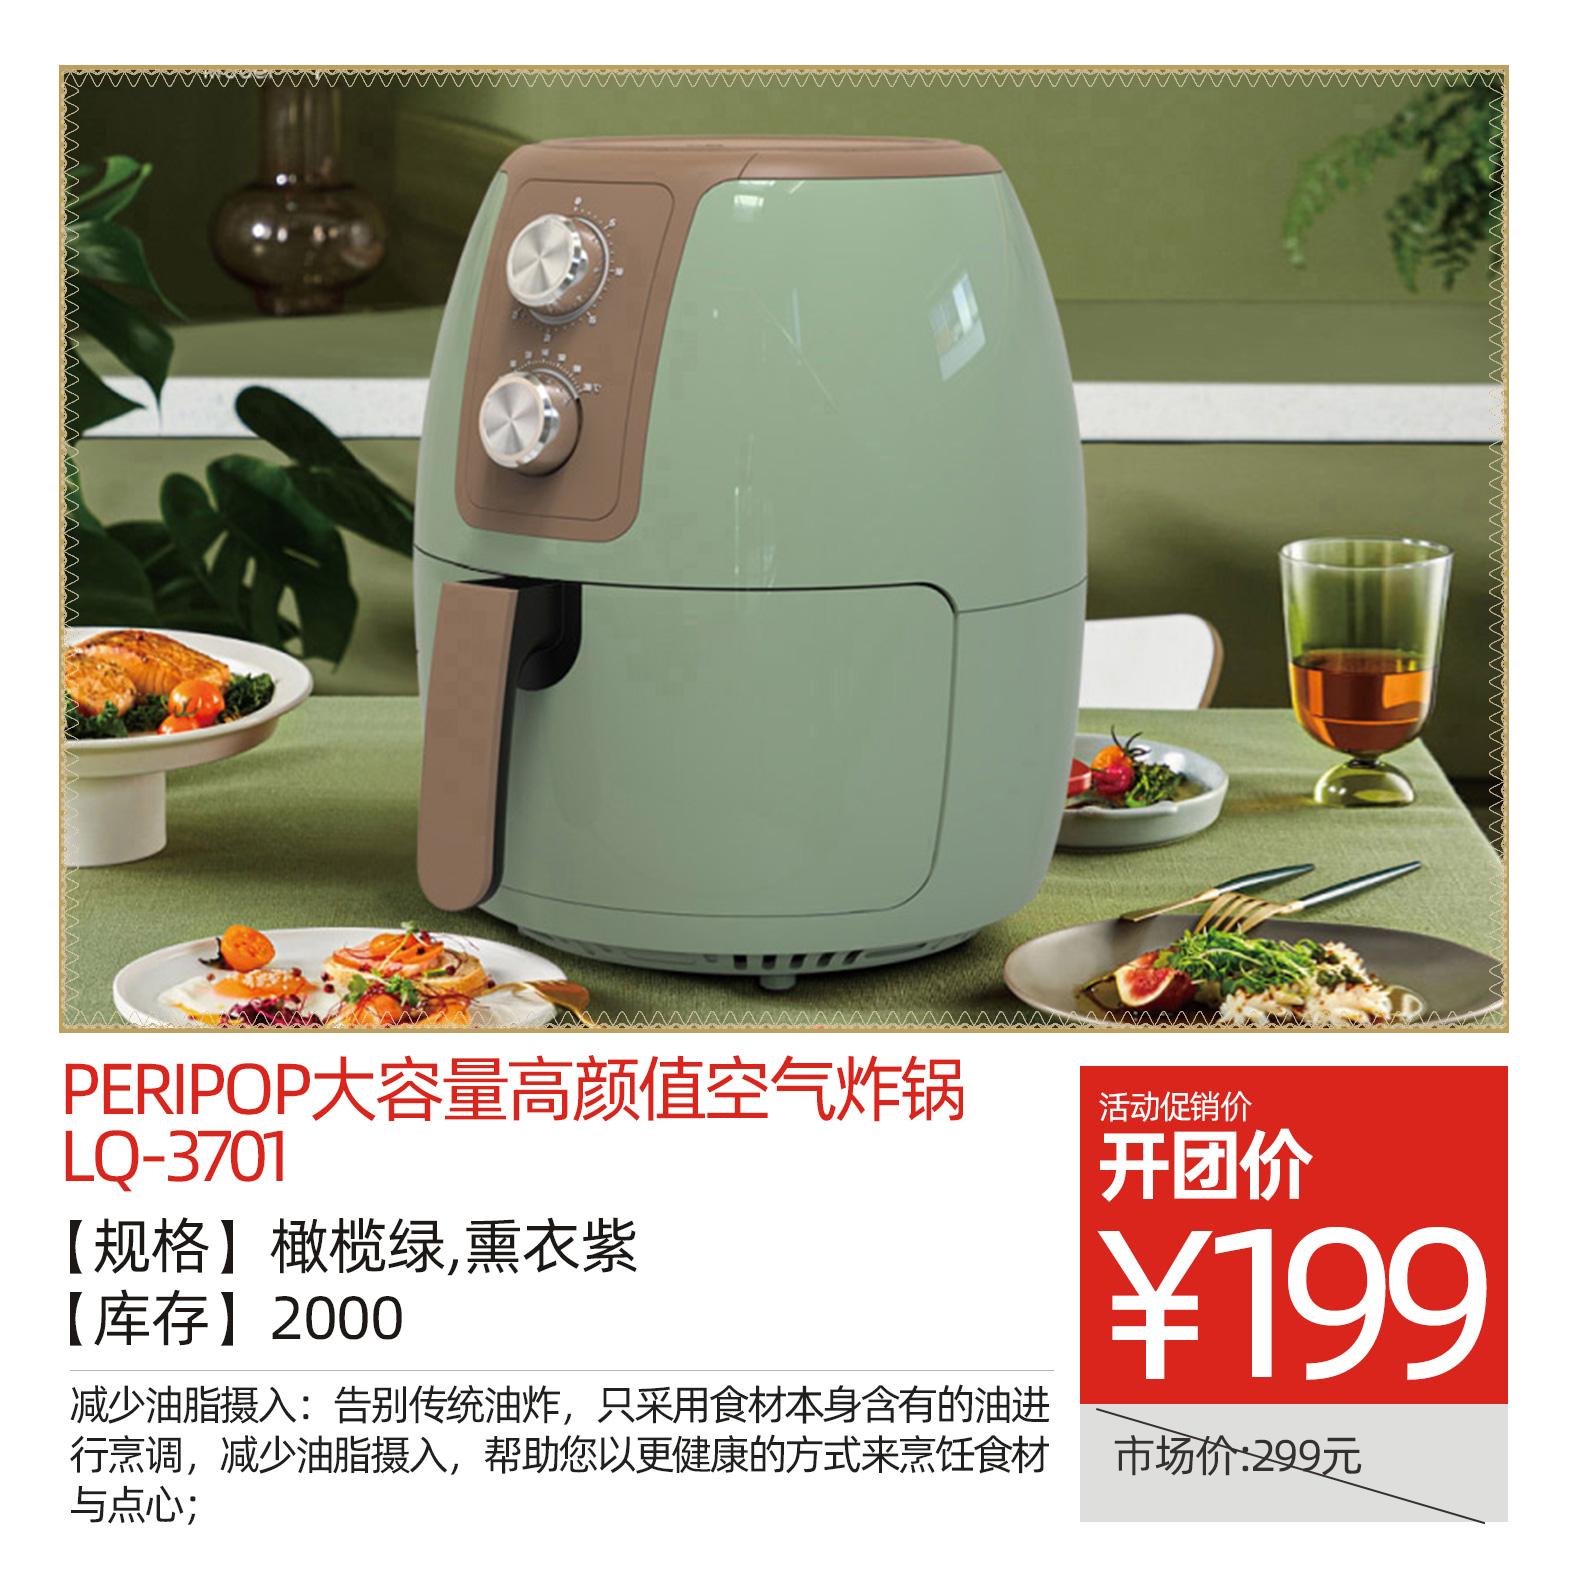 peripop大容量高颜值空气炸锅LQ-3701